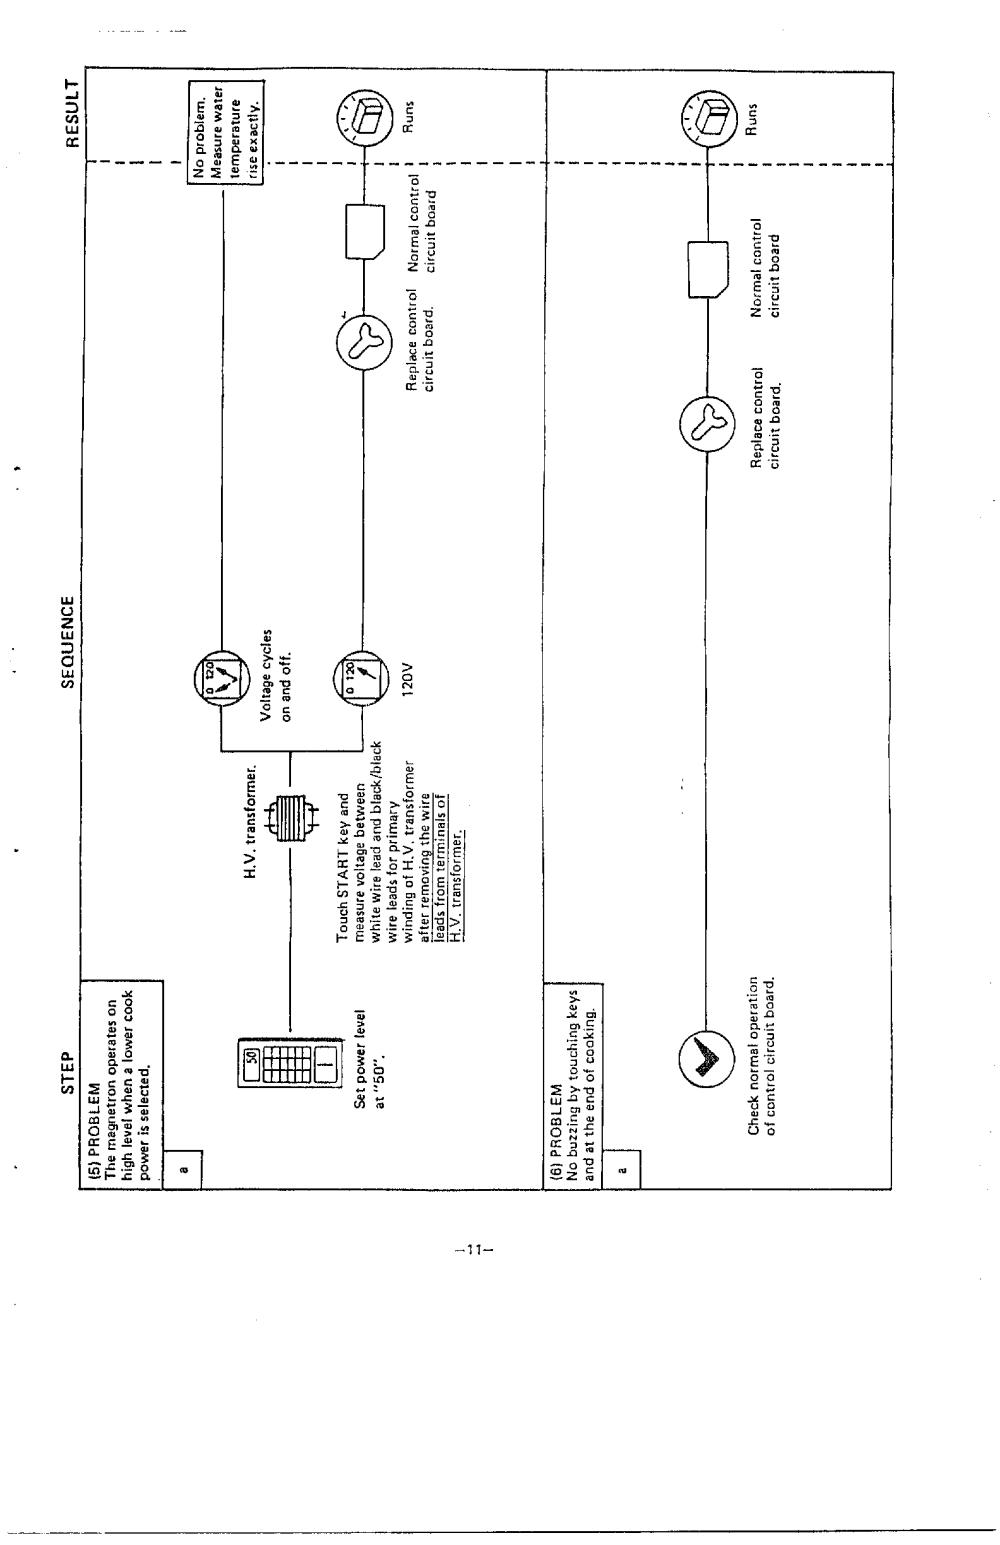 medium resolution of samsung microwave schematics get free image about wiring for sanyo refrigerator wiring diagram